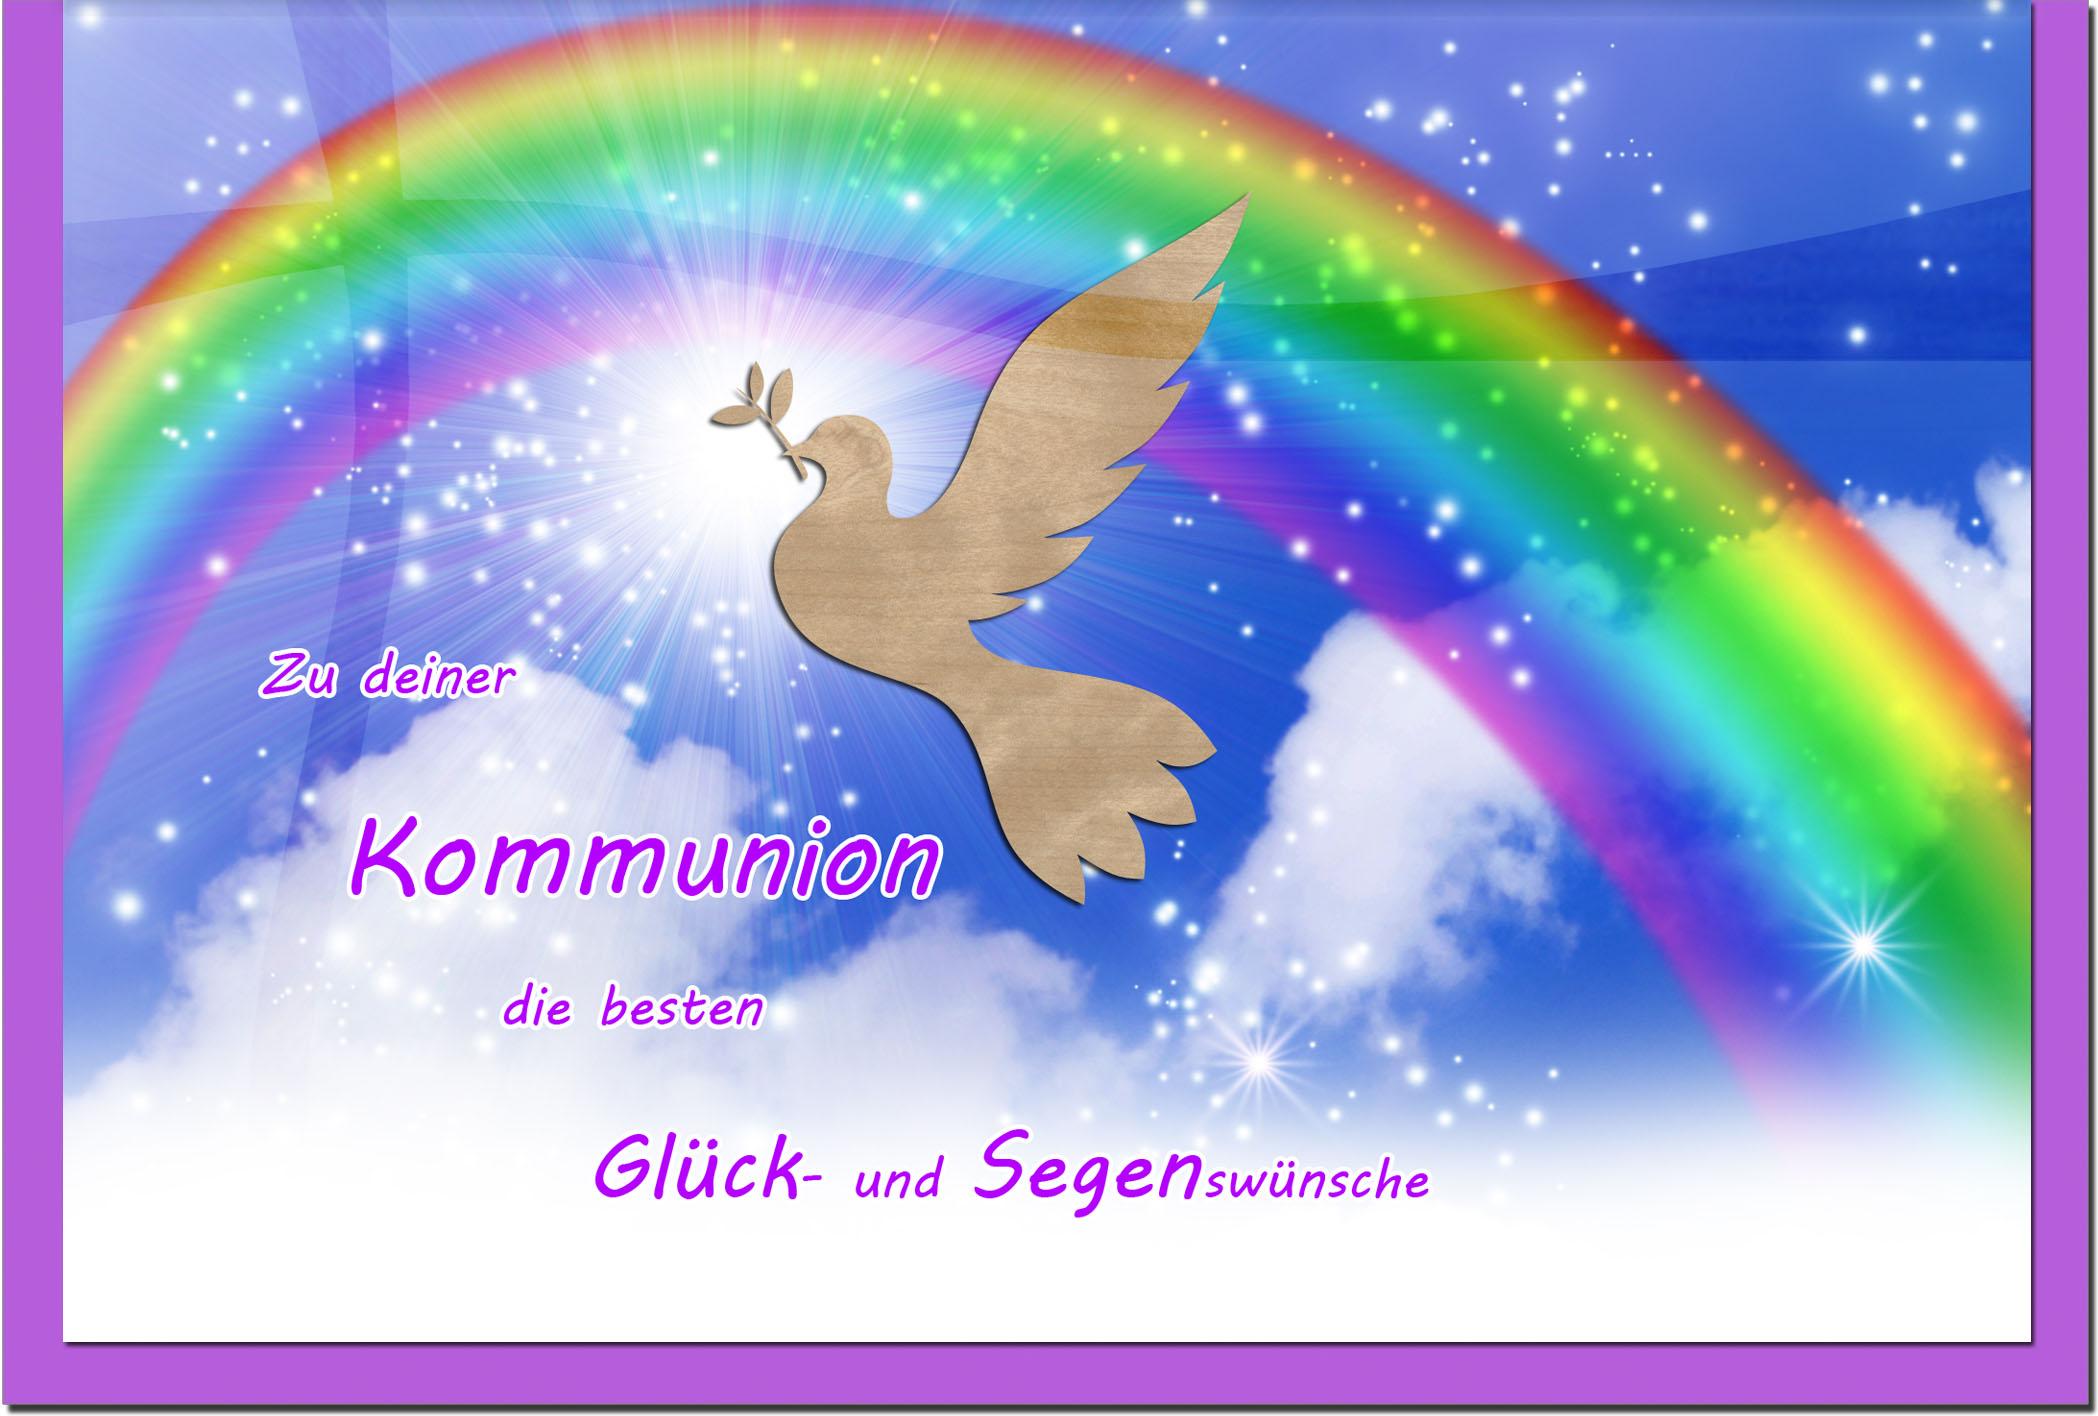 Kommunionskarten / Grußkarten / Glückwunschkarten /Kommunion Regenbogen